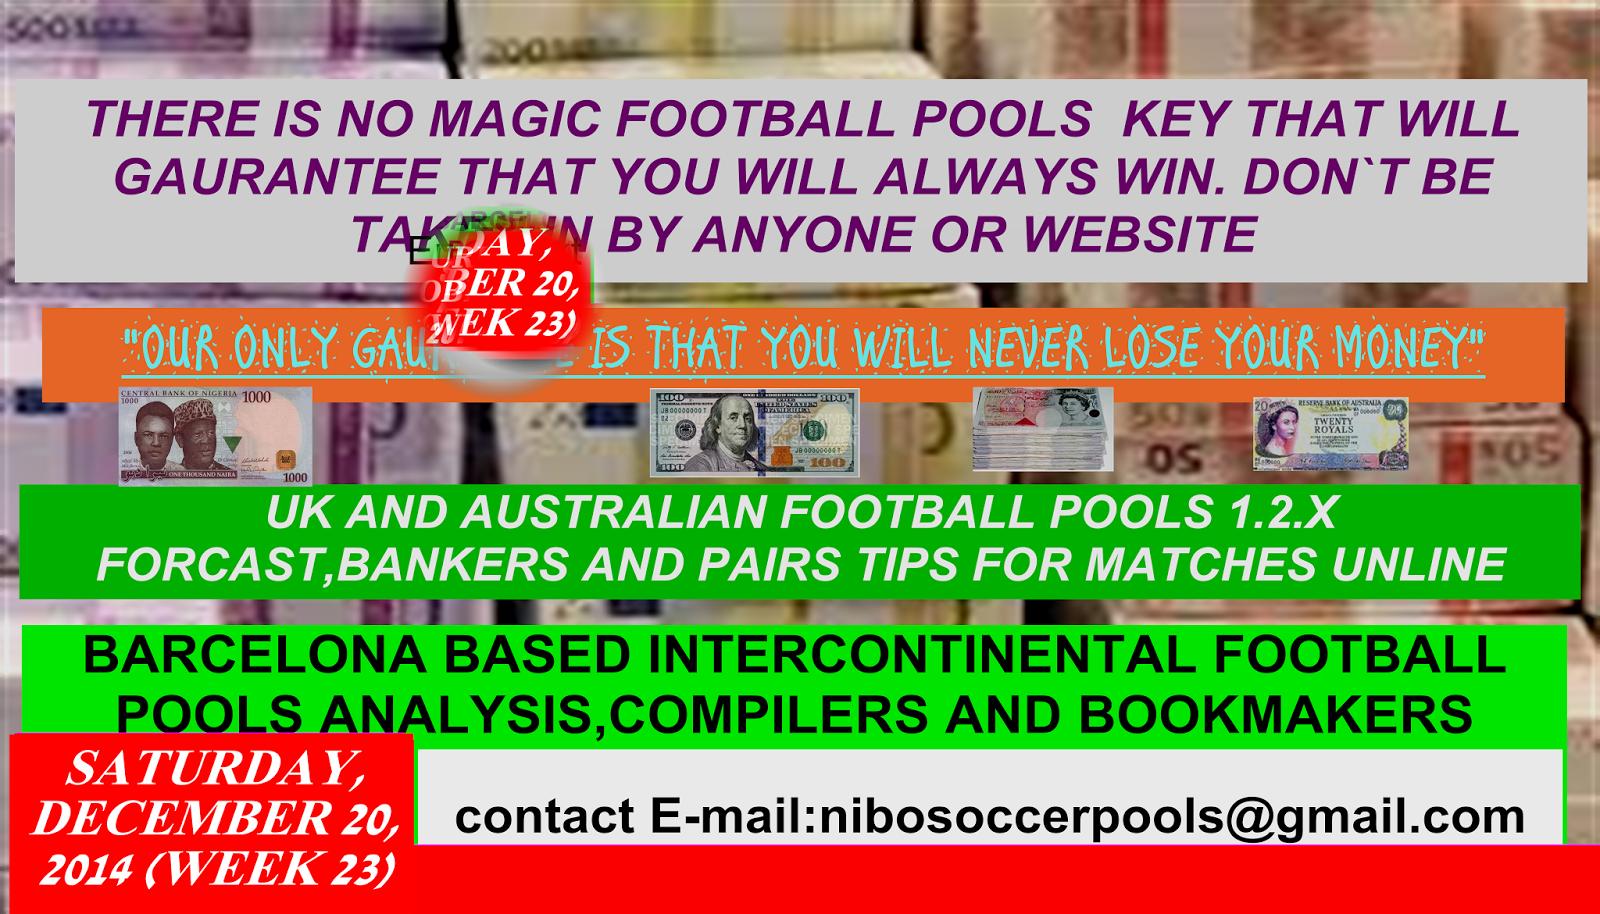 UK AND AUSTRALIAN FOOTBALL POOL 1 2 X EXPOSURE: 2014